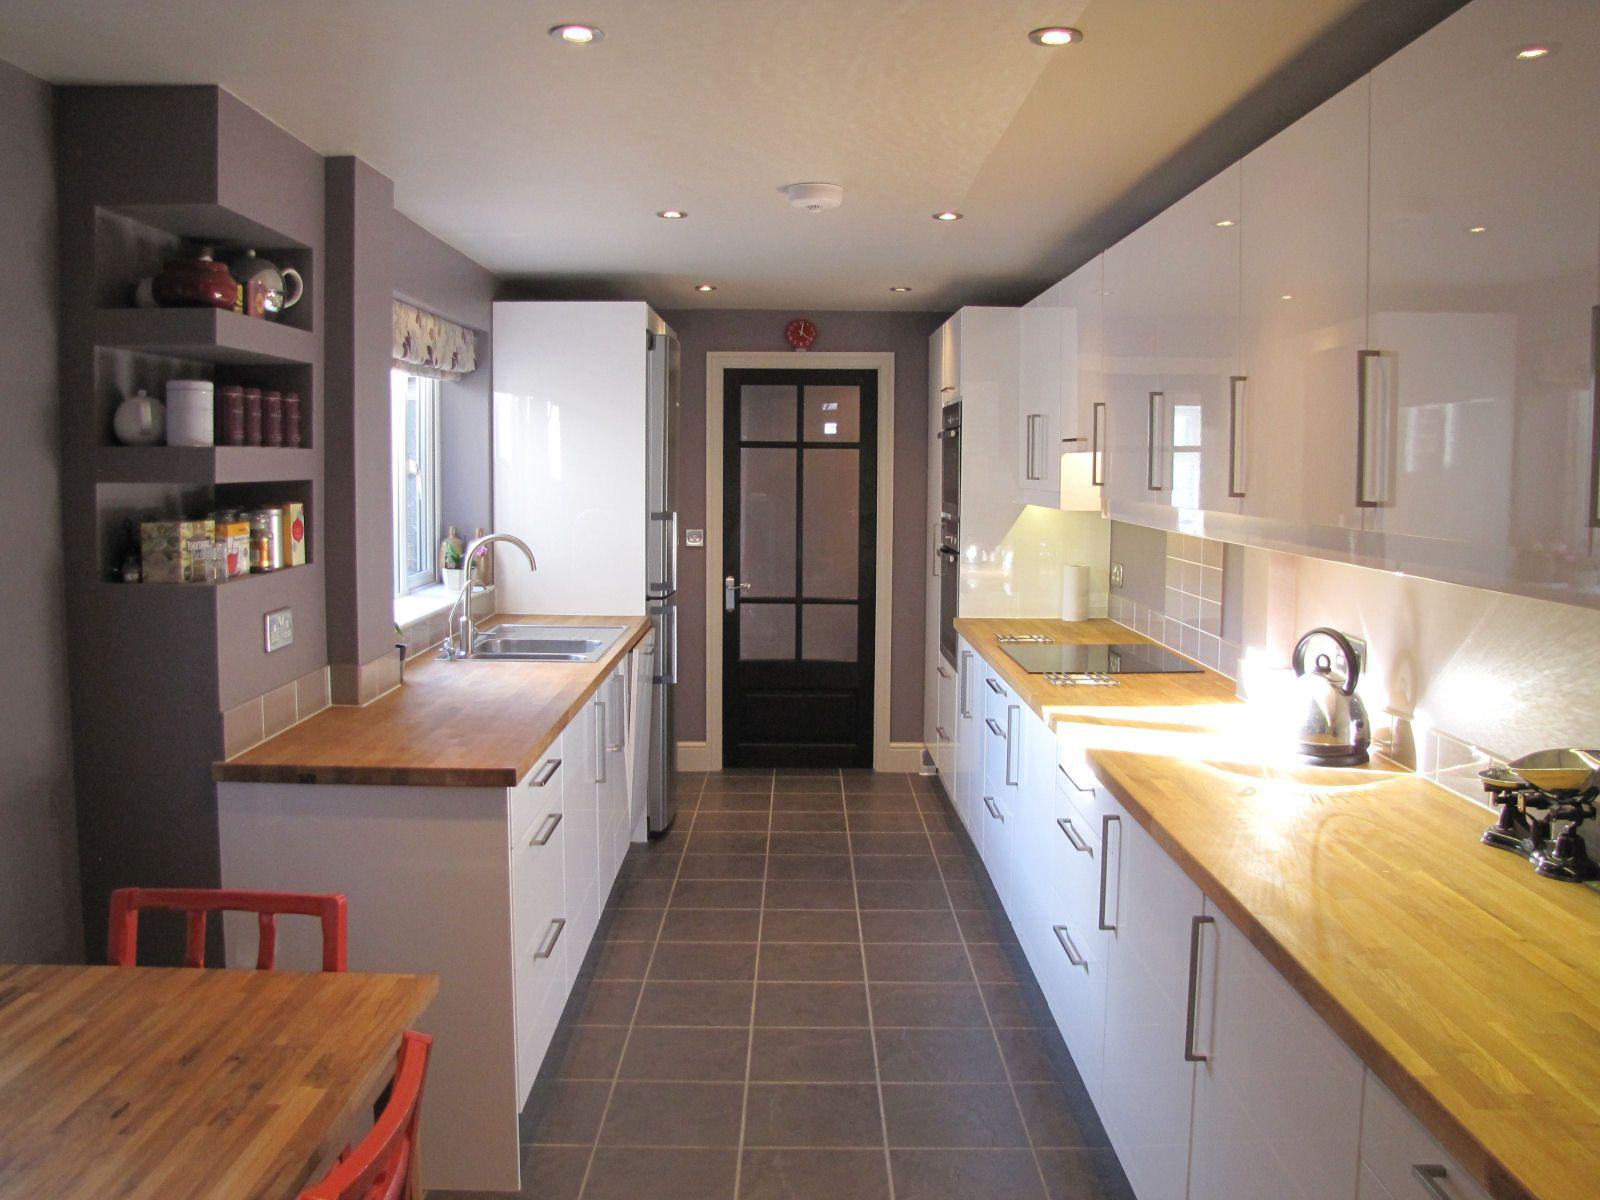 Terrace House Small Kitchen Design Google Search